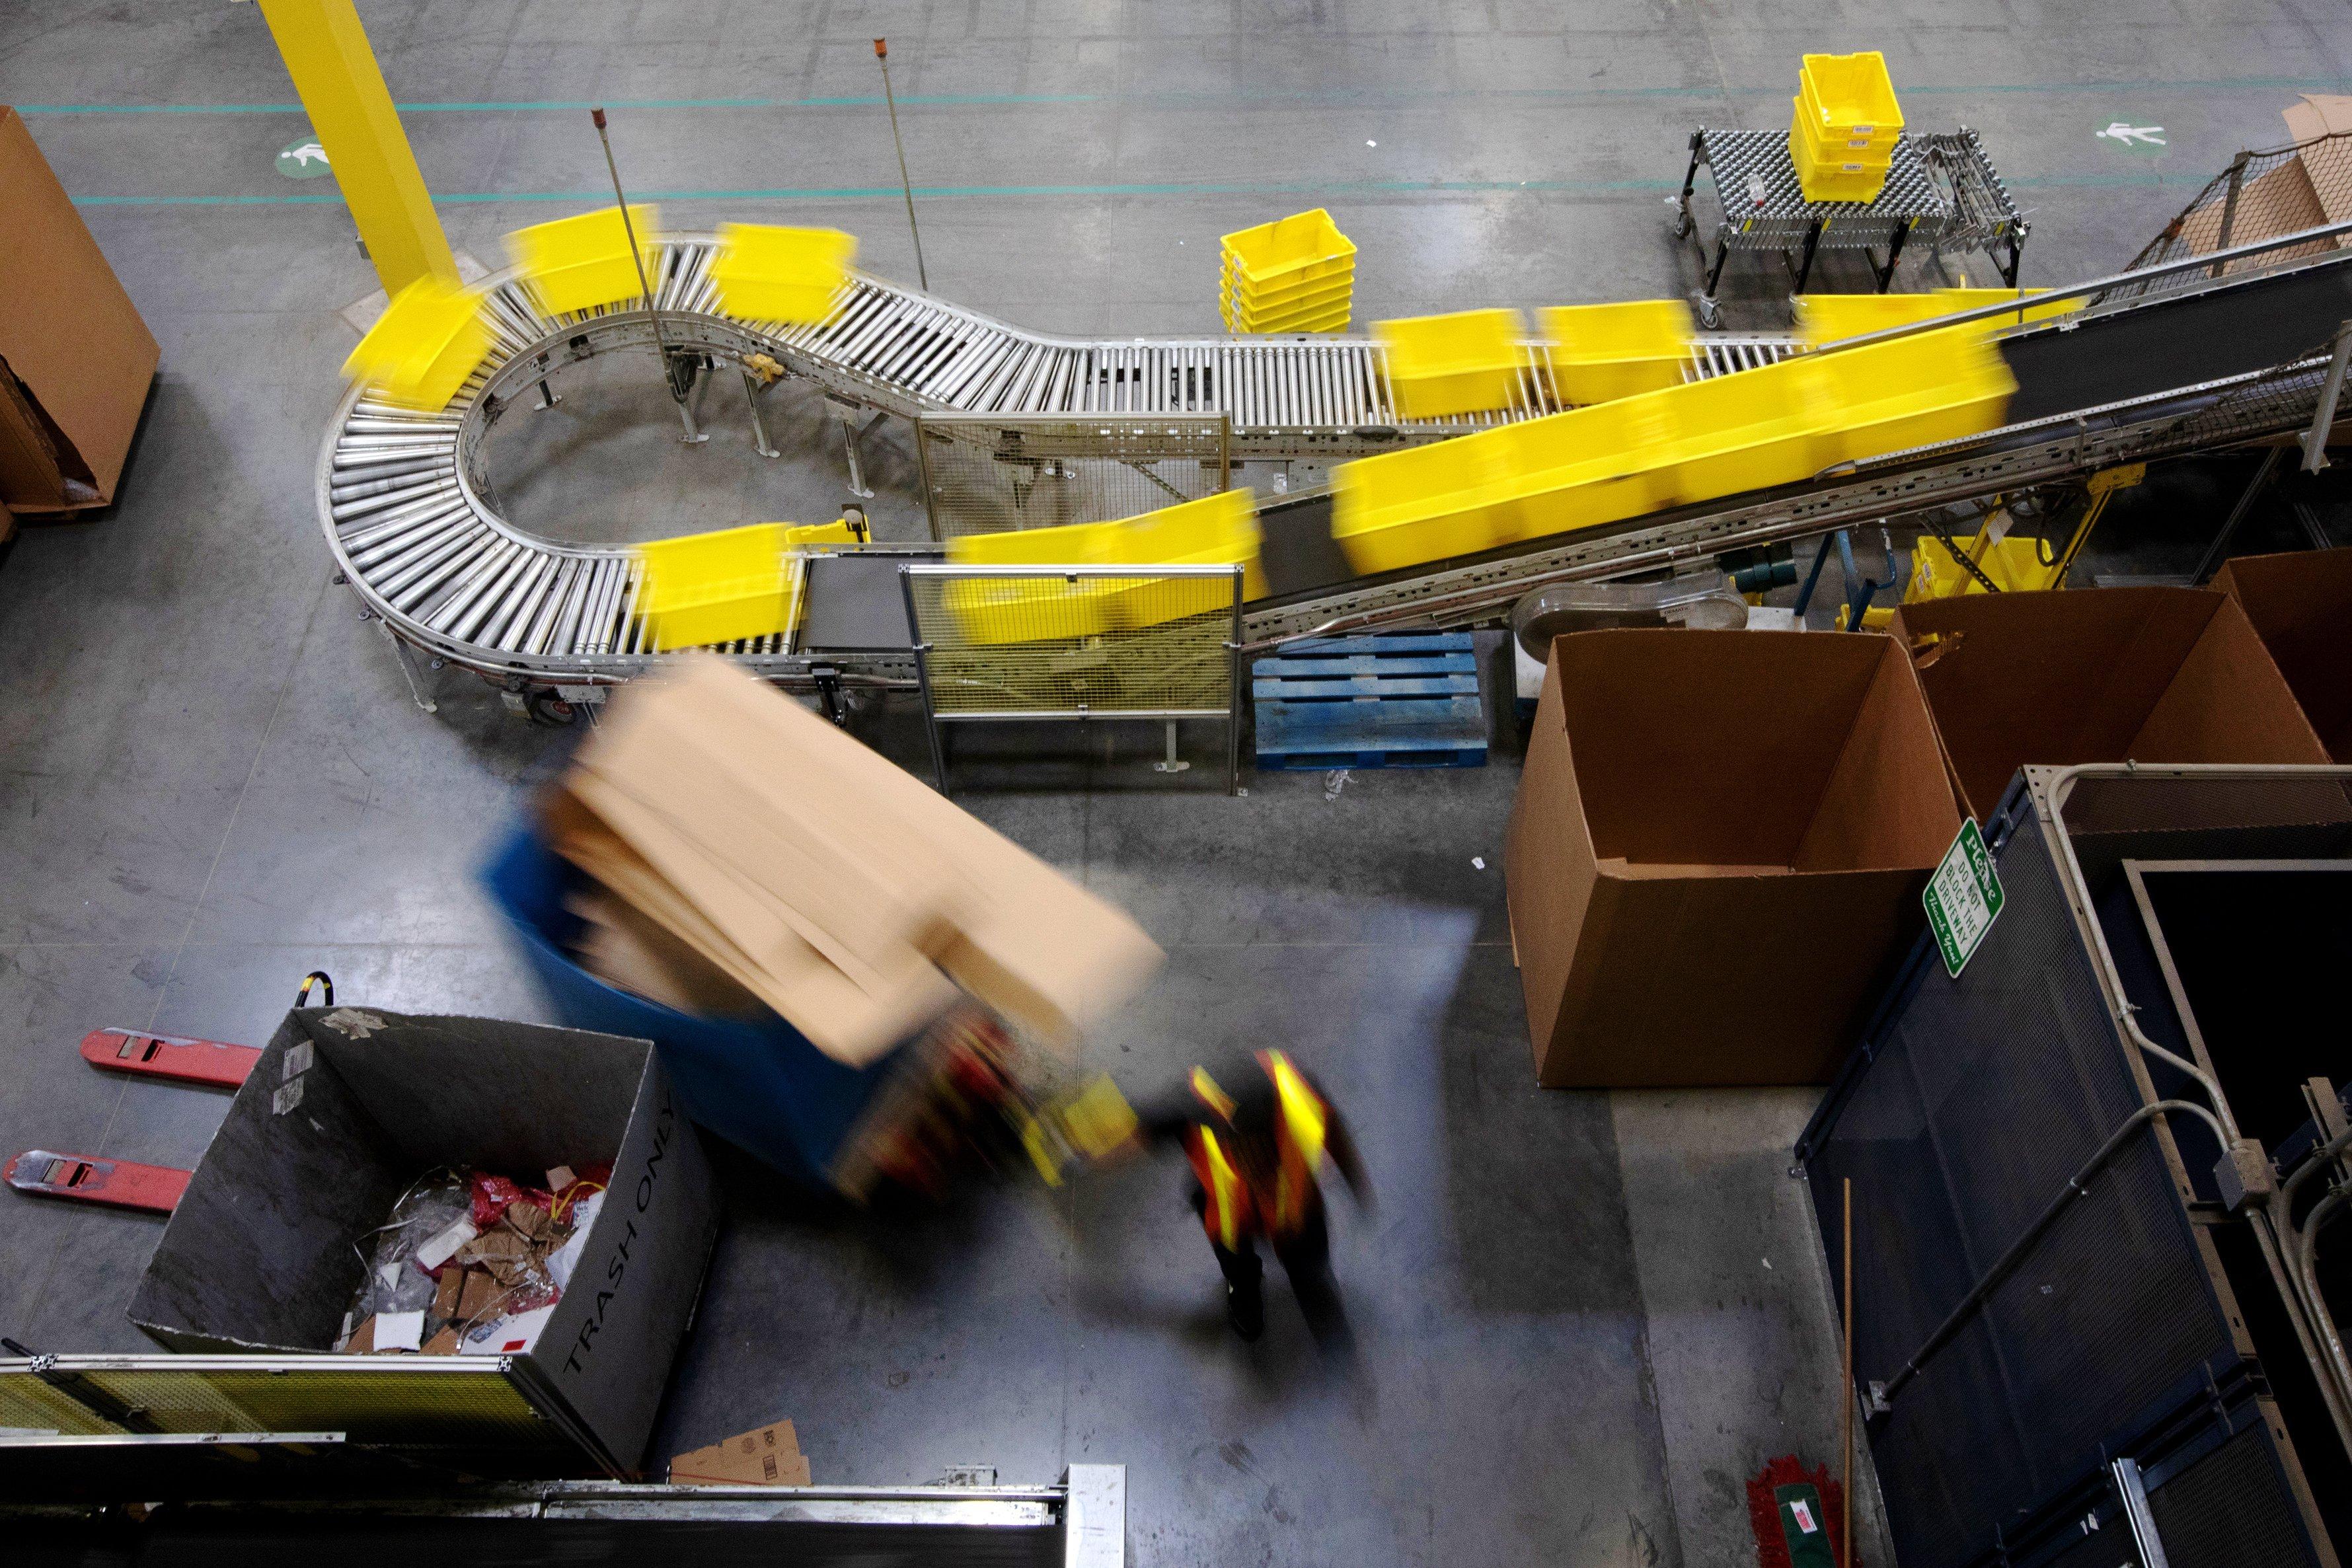 1,000 Amazon employees plan walkout Friday, saying company's climate pledge isn't enough